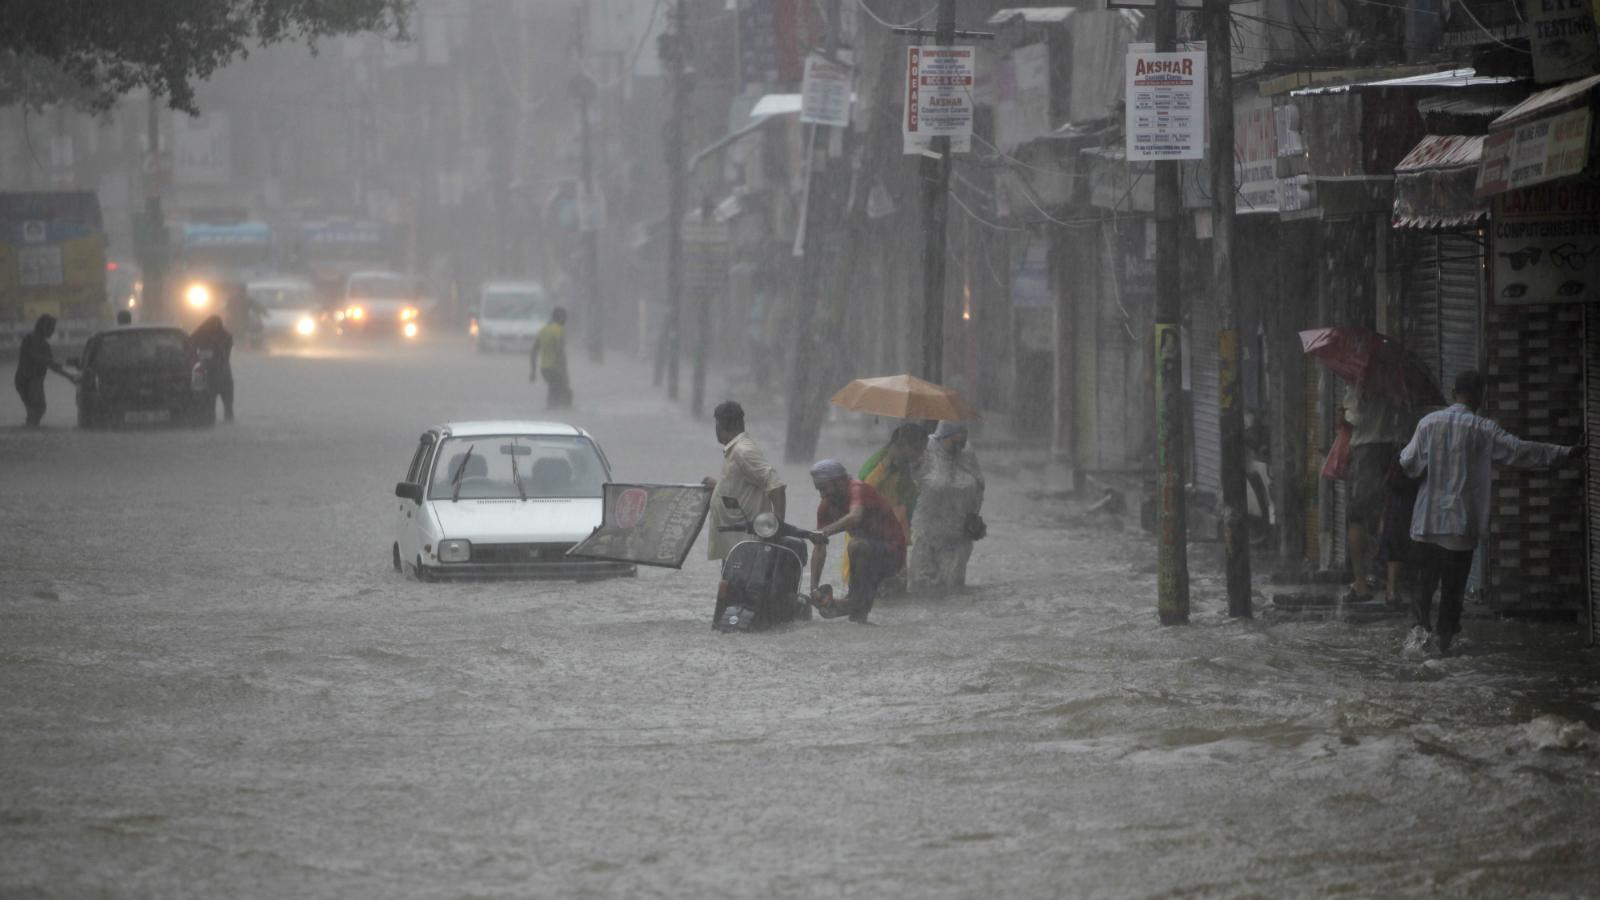 Floods-India-Gurgaon-Assam-Bengaluru